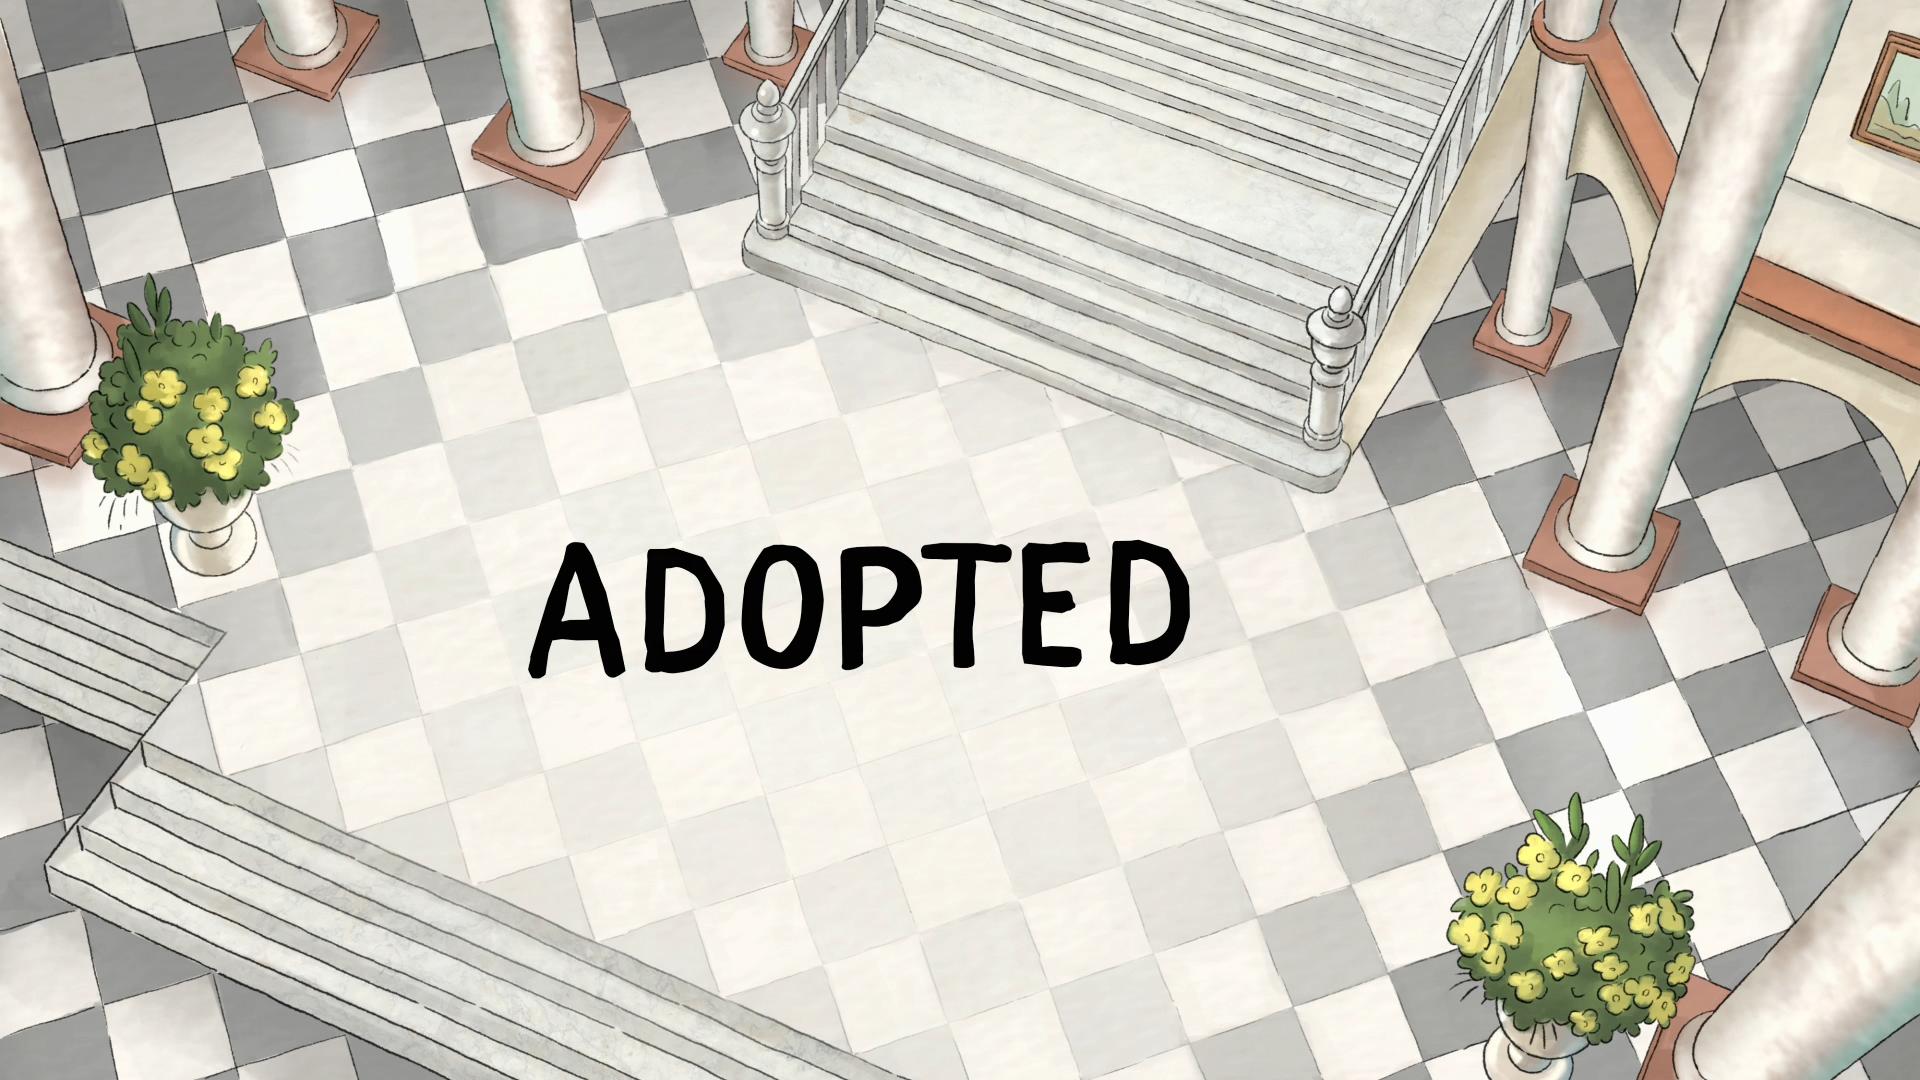 Мы обычные медведи — s04e29 — Adopted